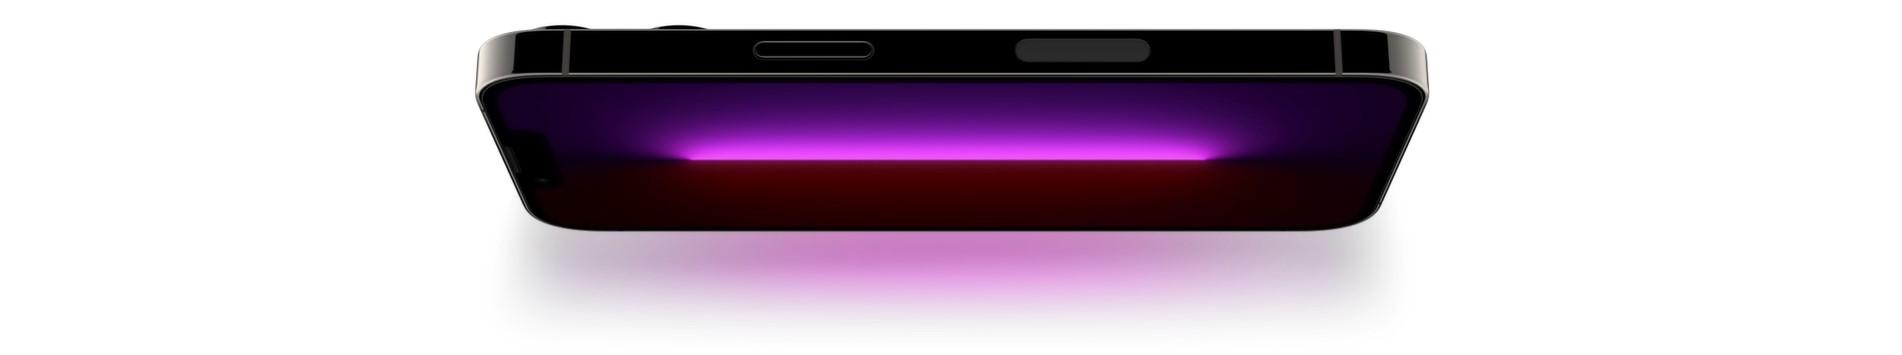 Apple_iphone_13_pro_13_pro_max_sold_by_Technomobi_11